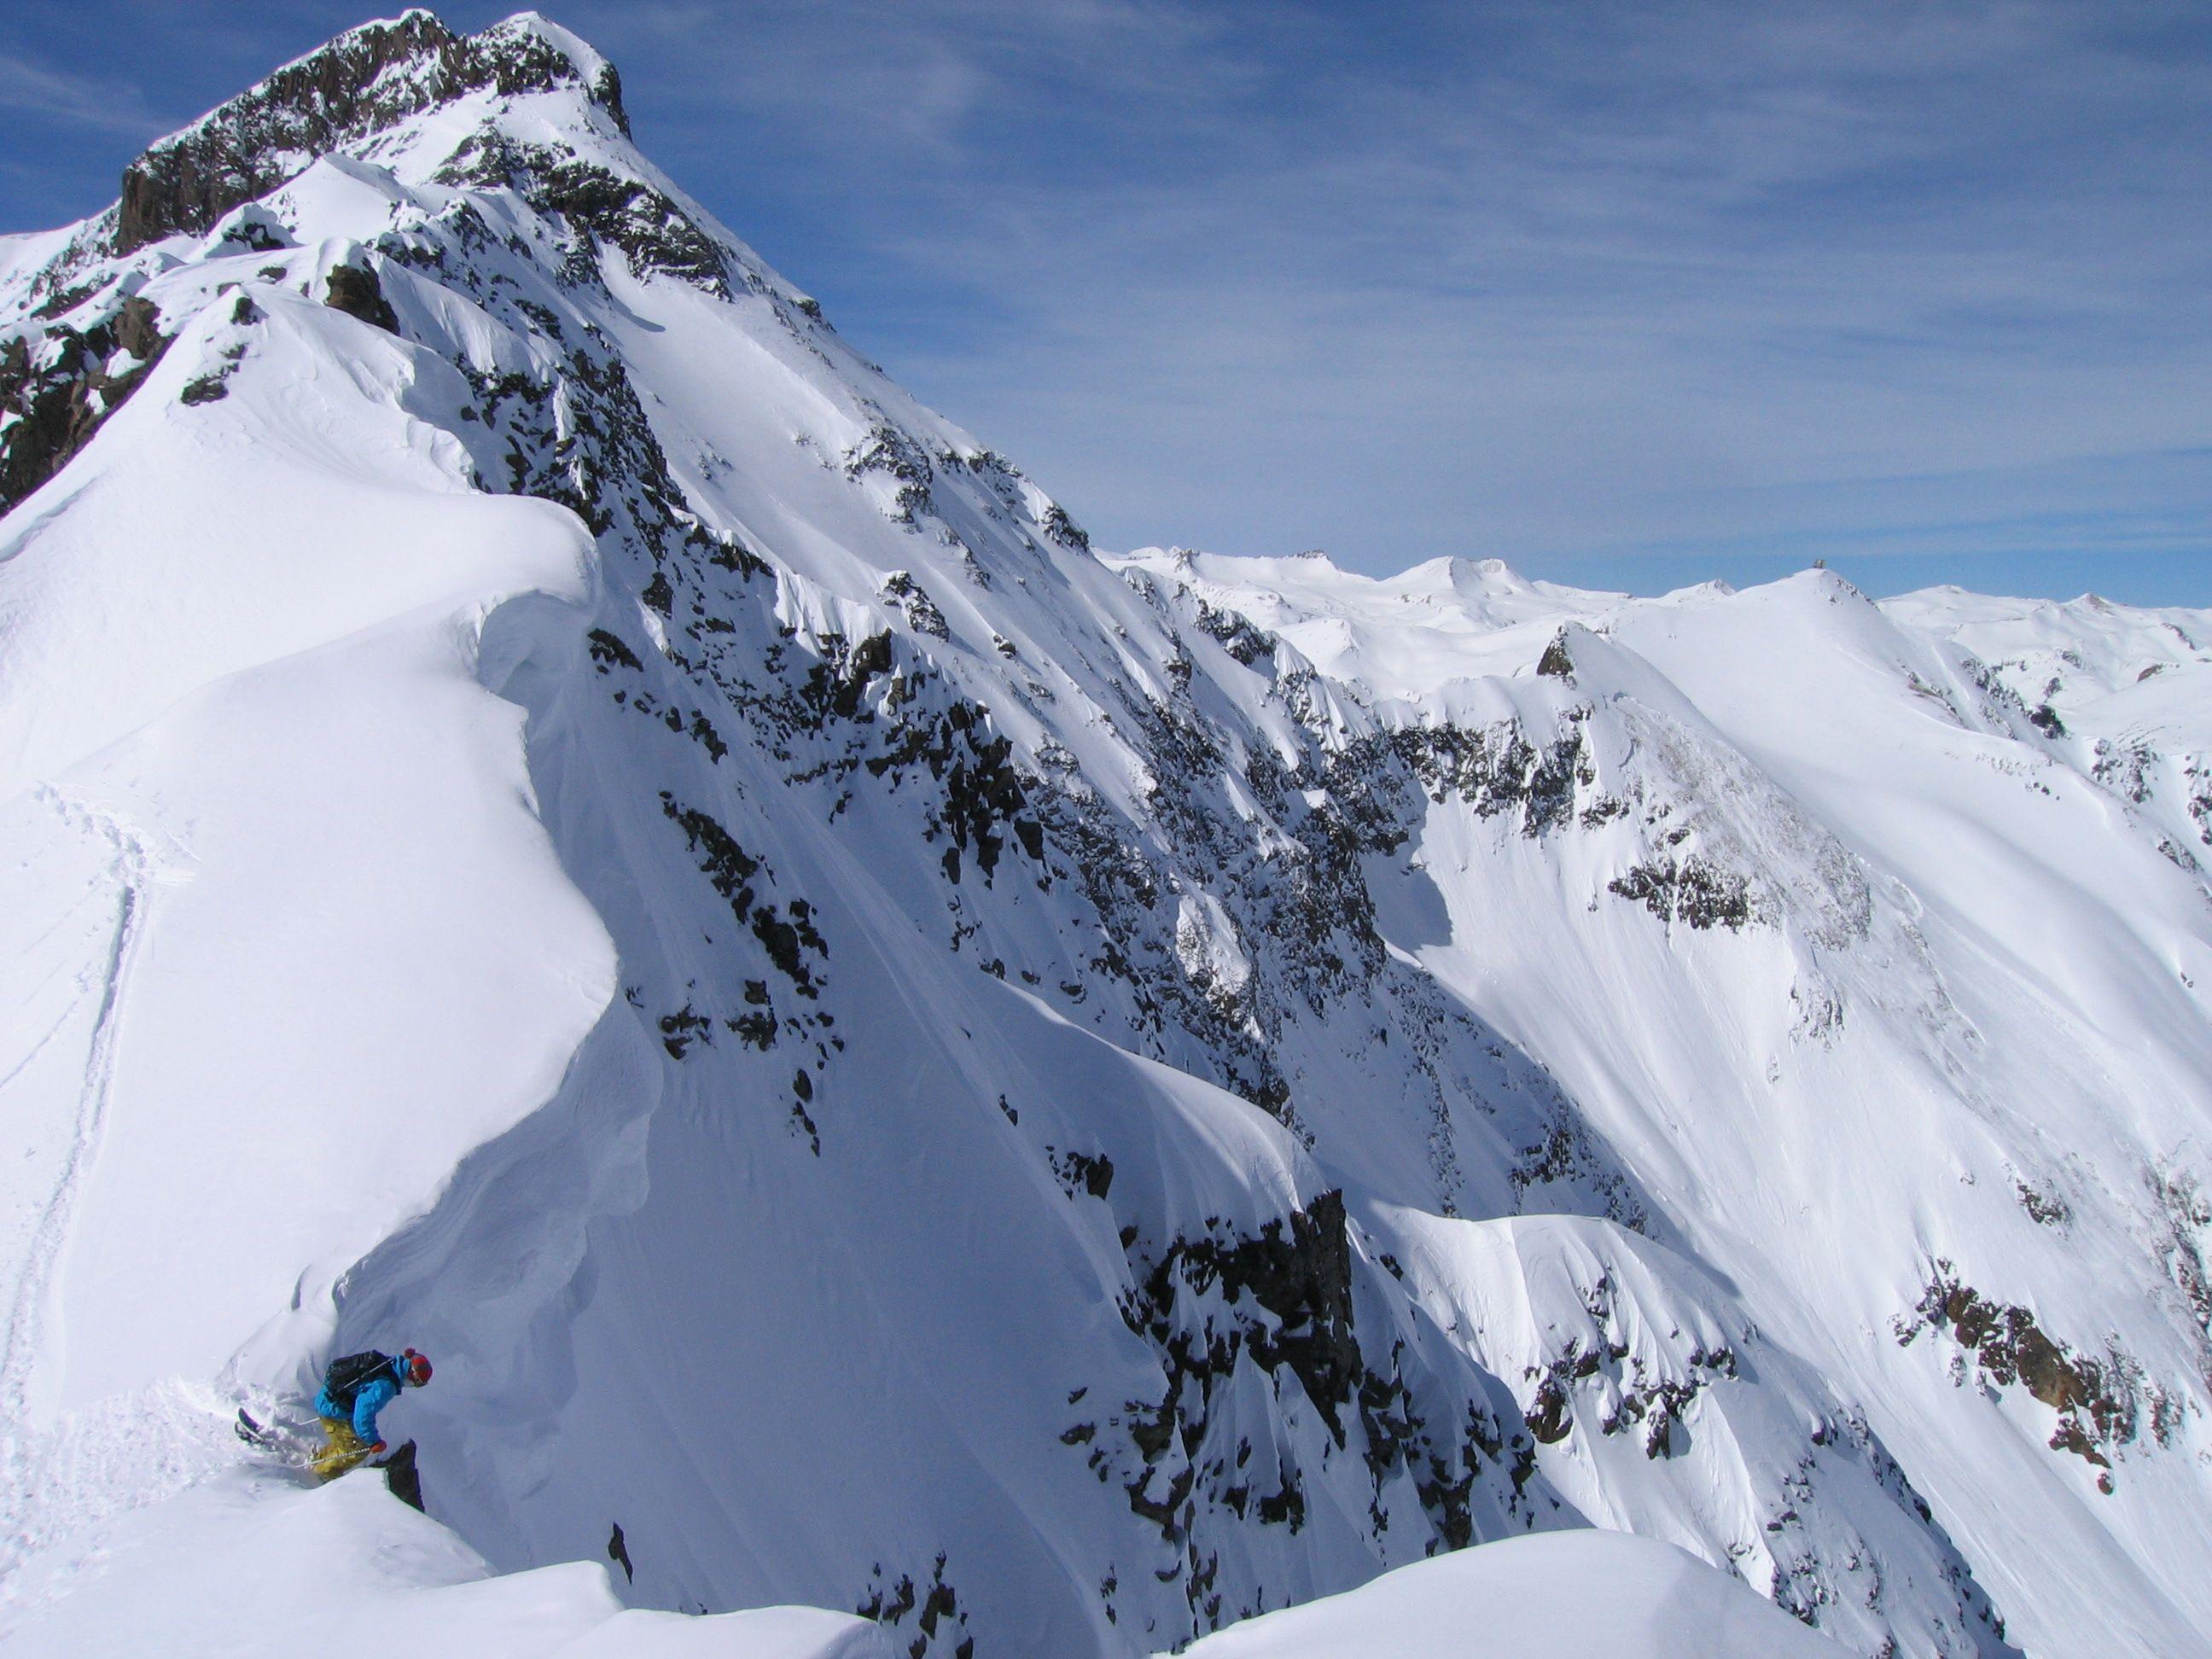 Skiing Southern Colorado S Powder Highway Heli Skiing Colorado Vacation Colorado Tourism